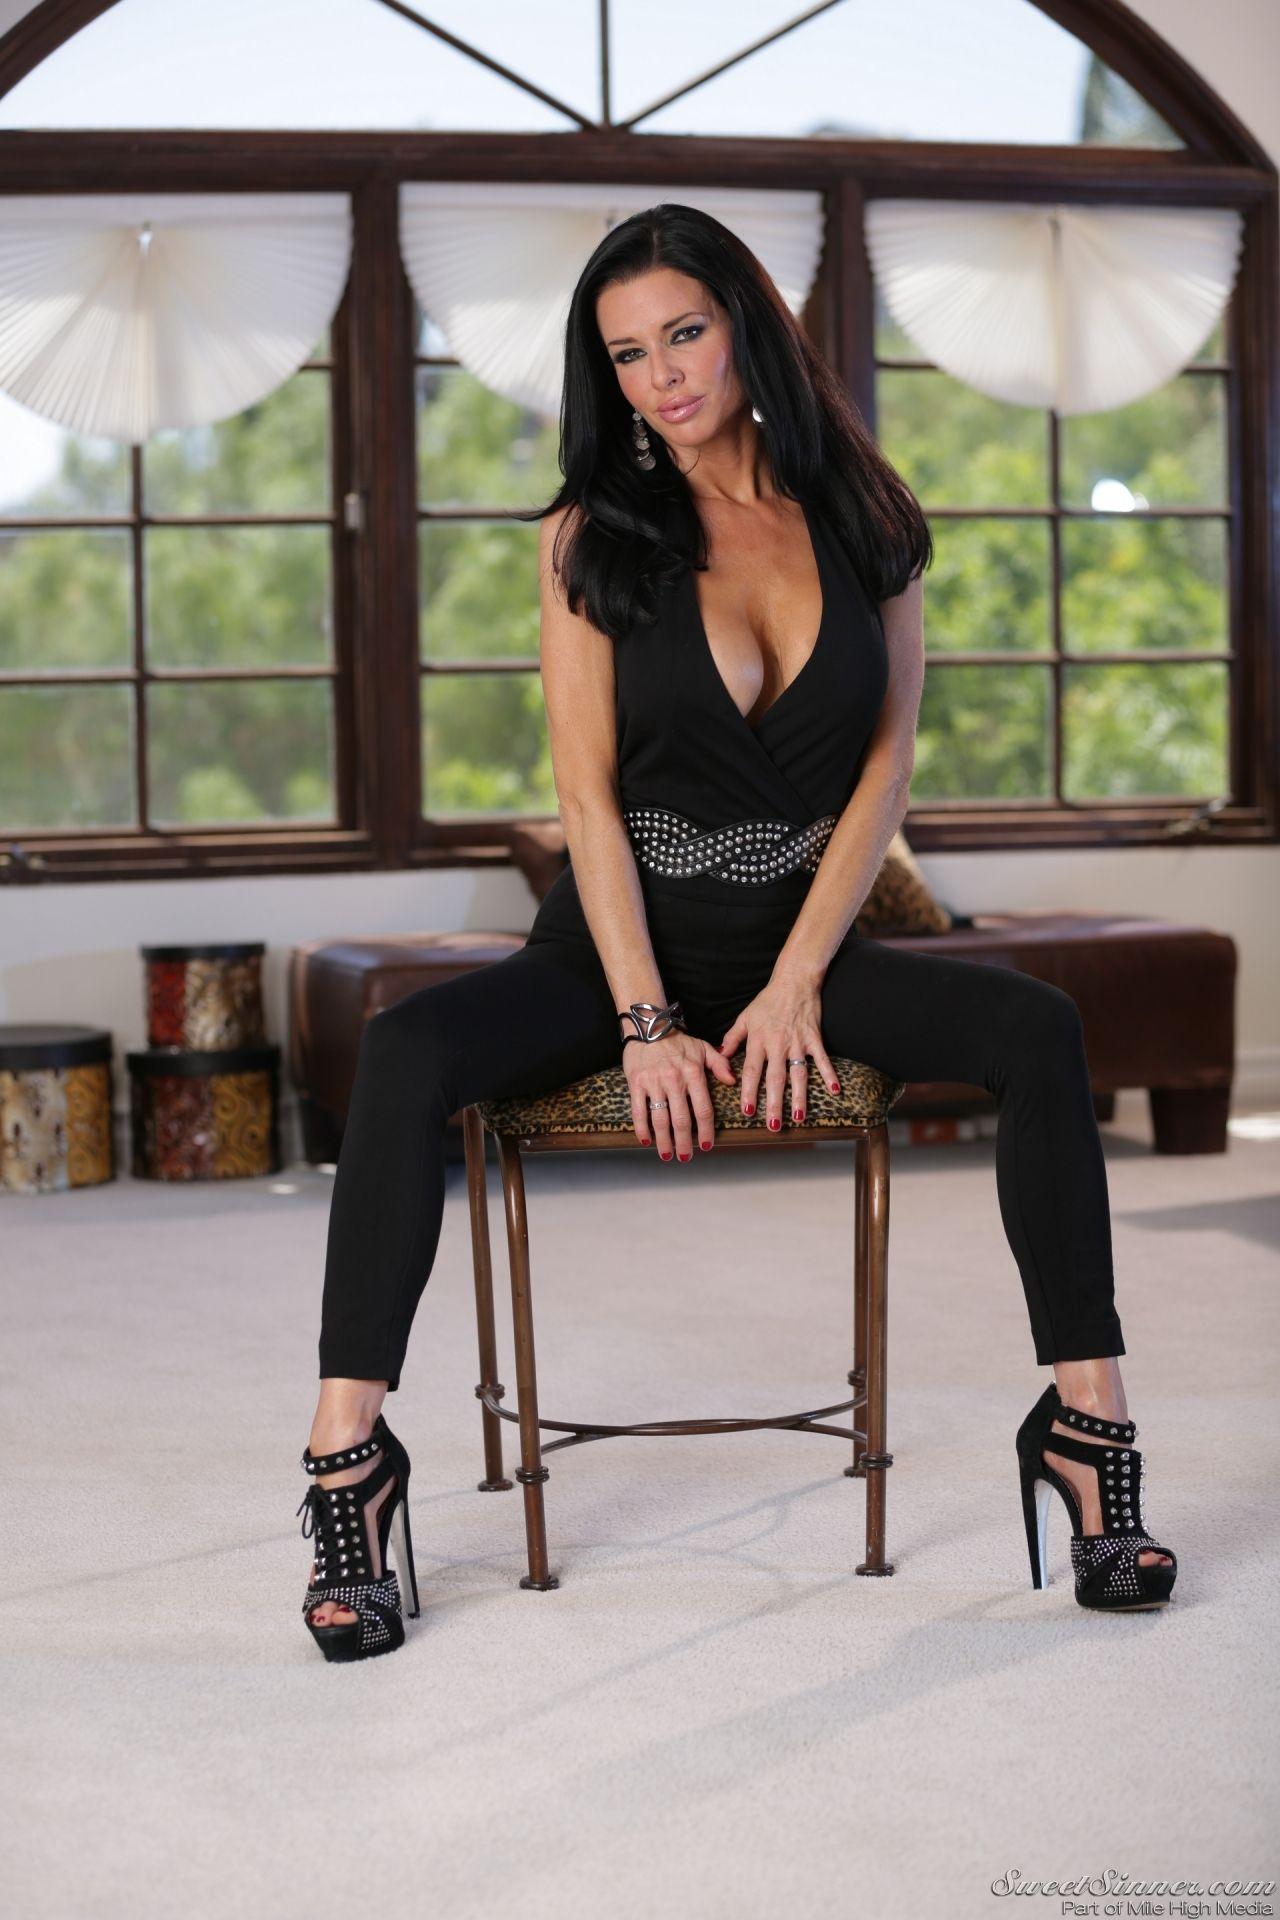 Veronica Avluv The Swinger Photoshoot Feb 2014